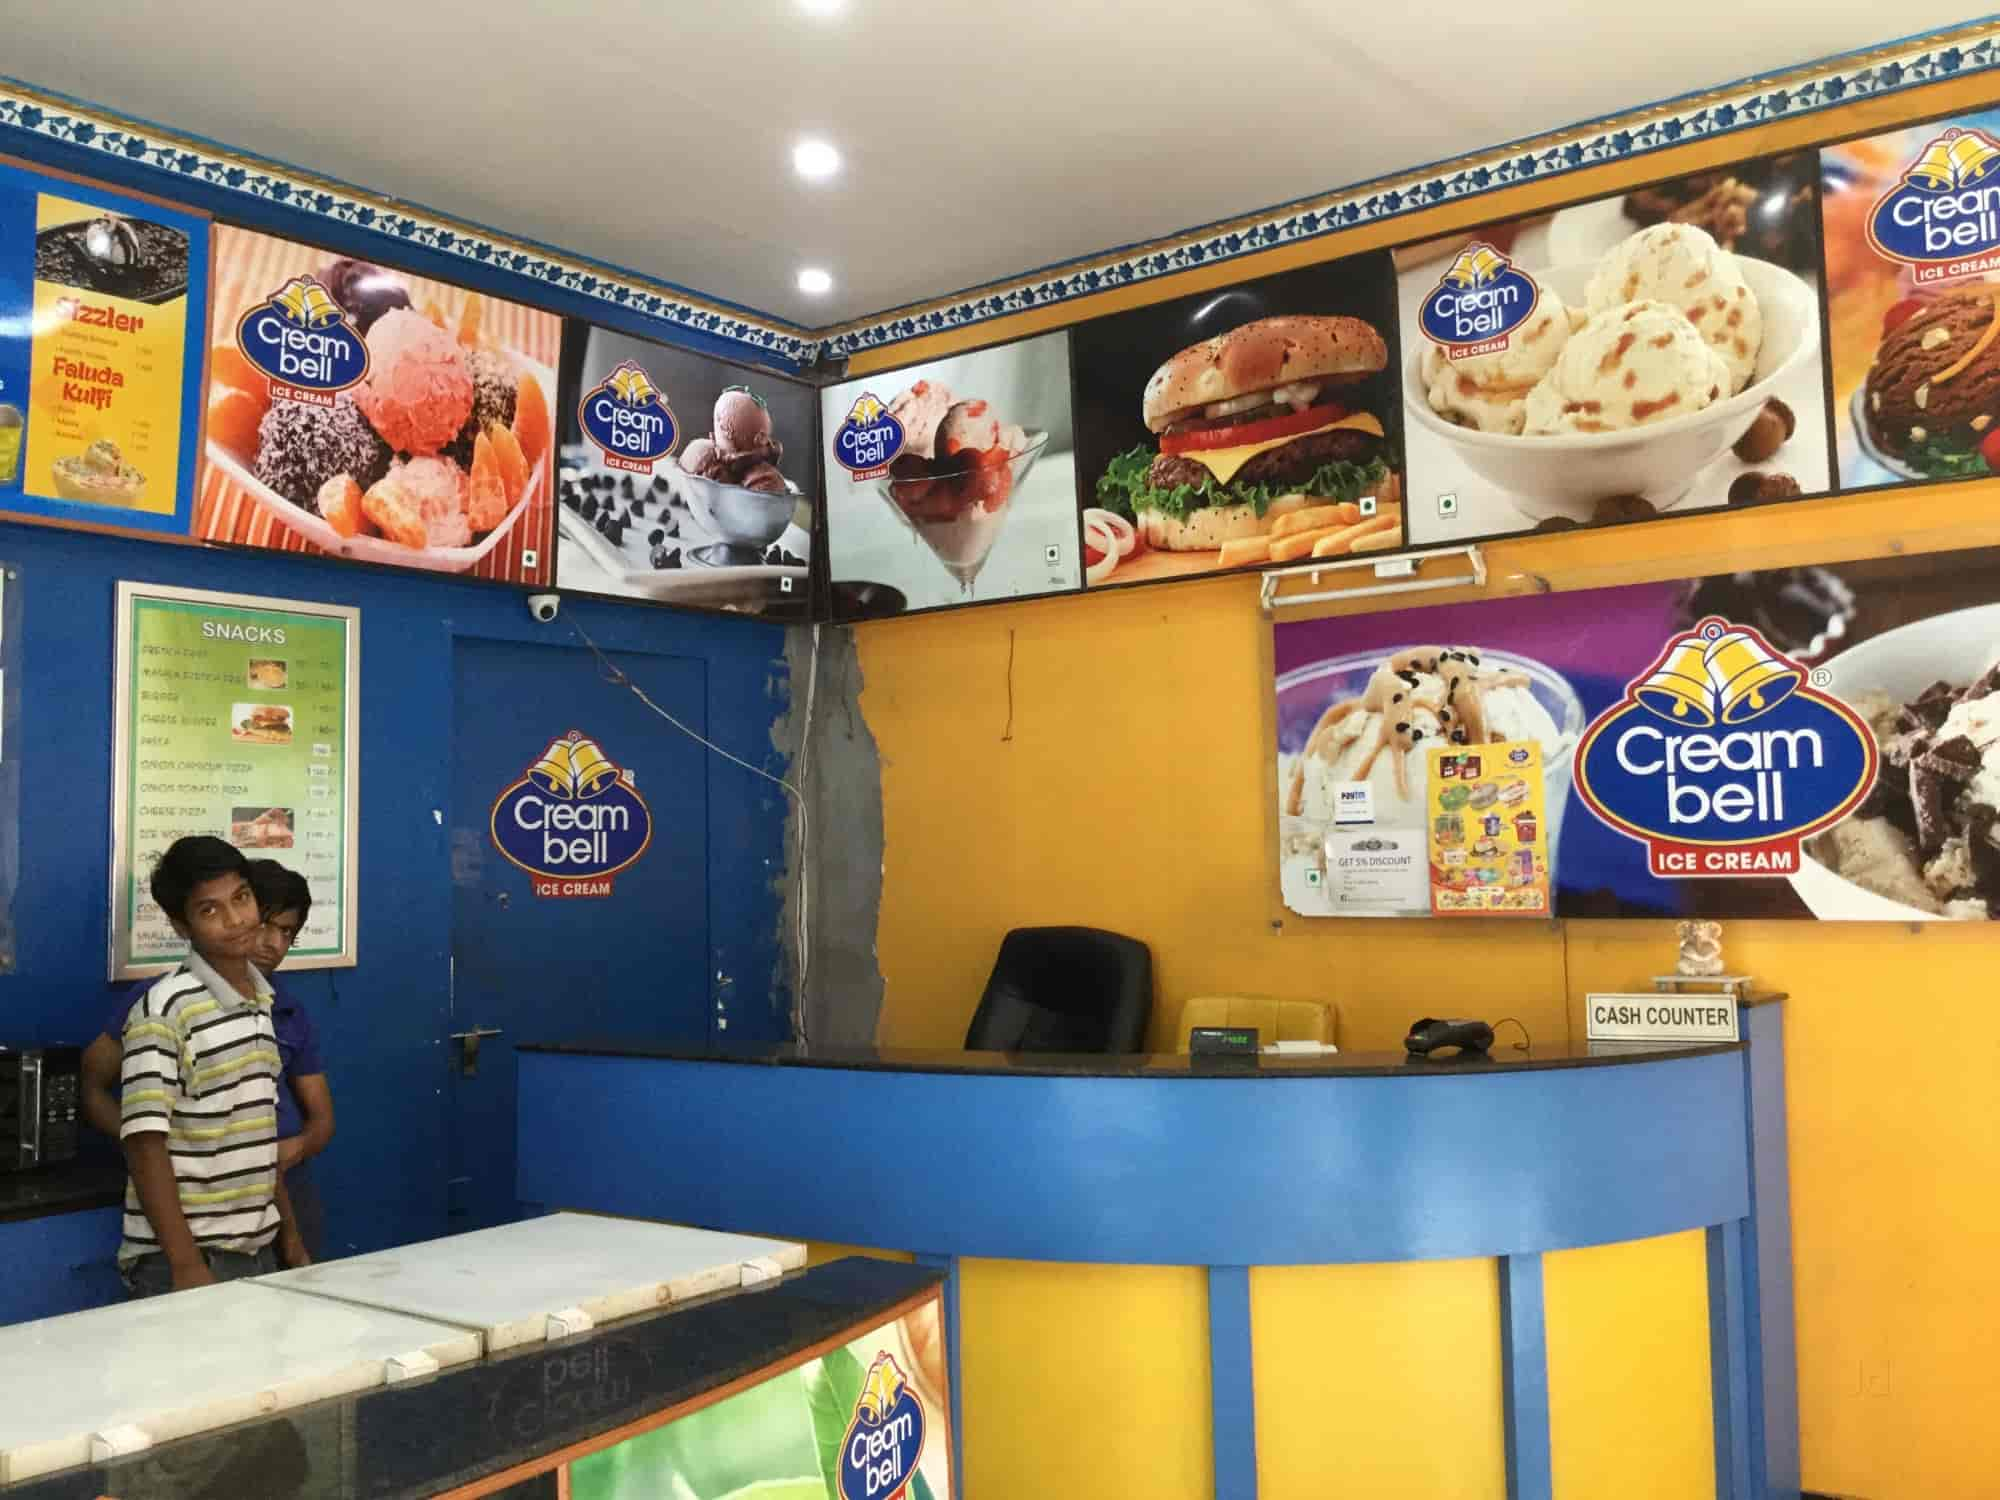 Ice World, New Mandi, Muzaffarnagar - Cake Shops - Justdial